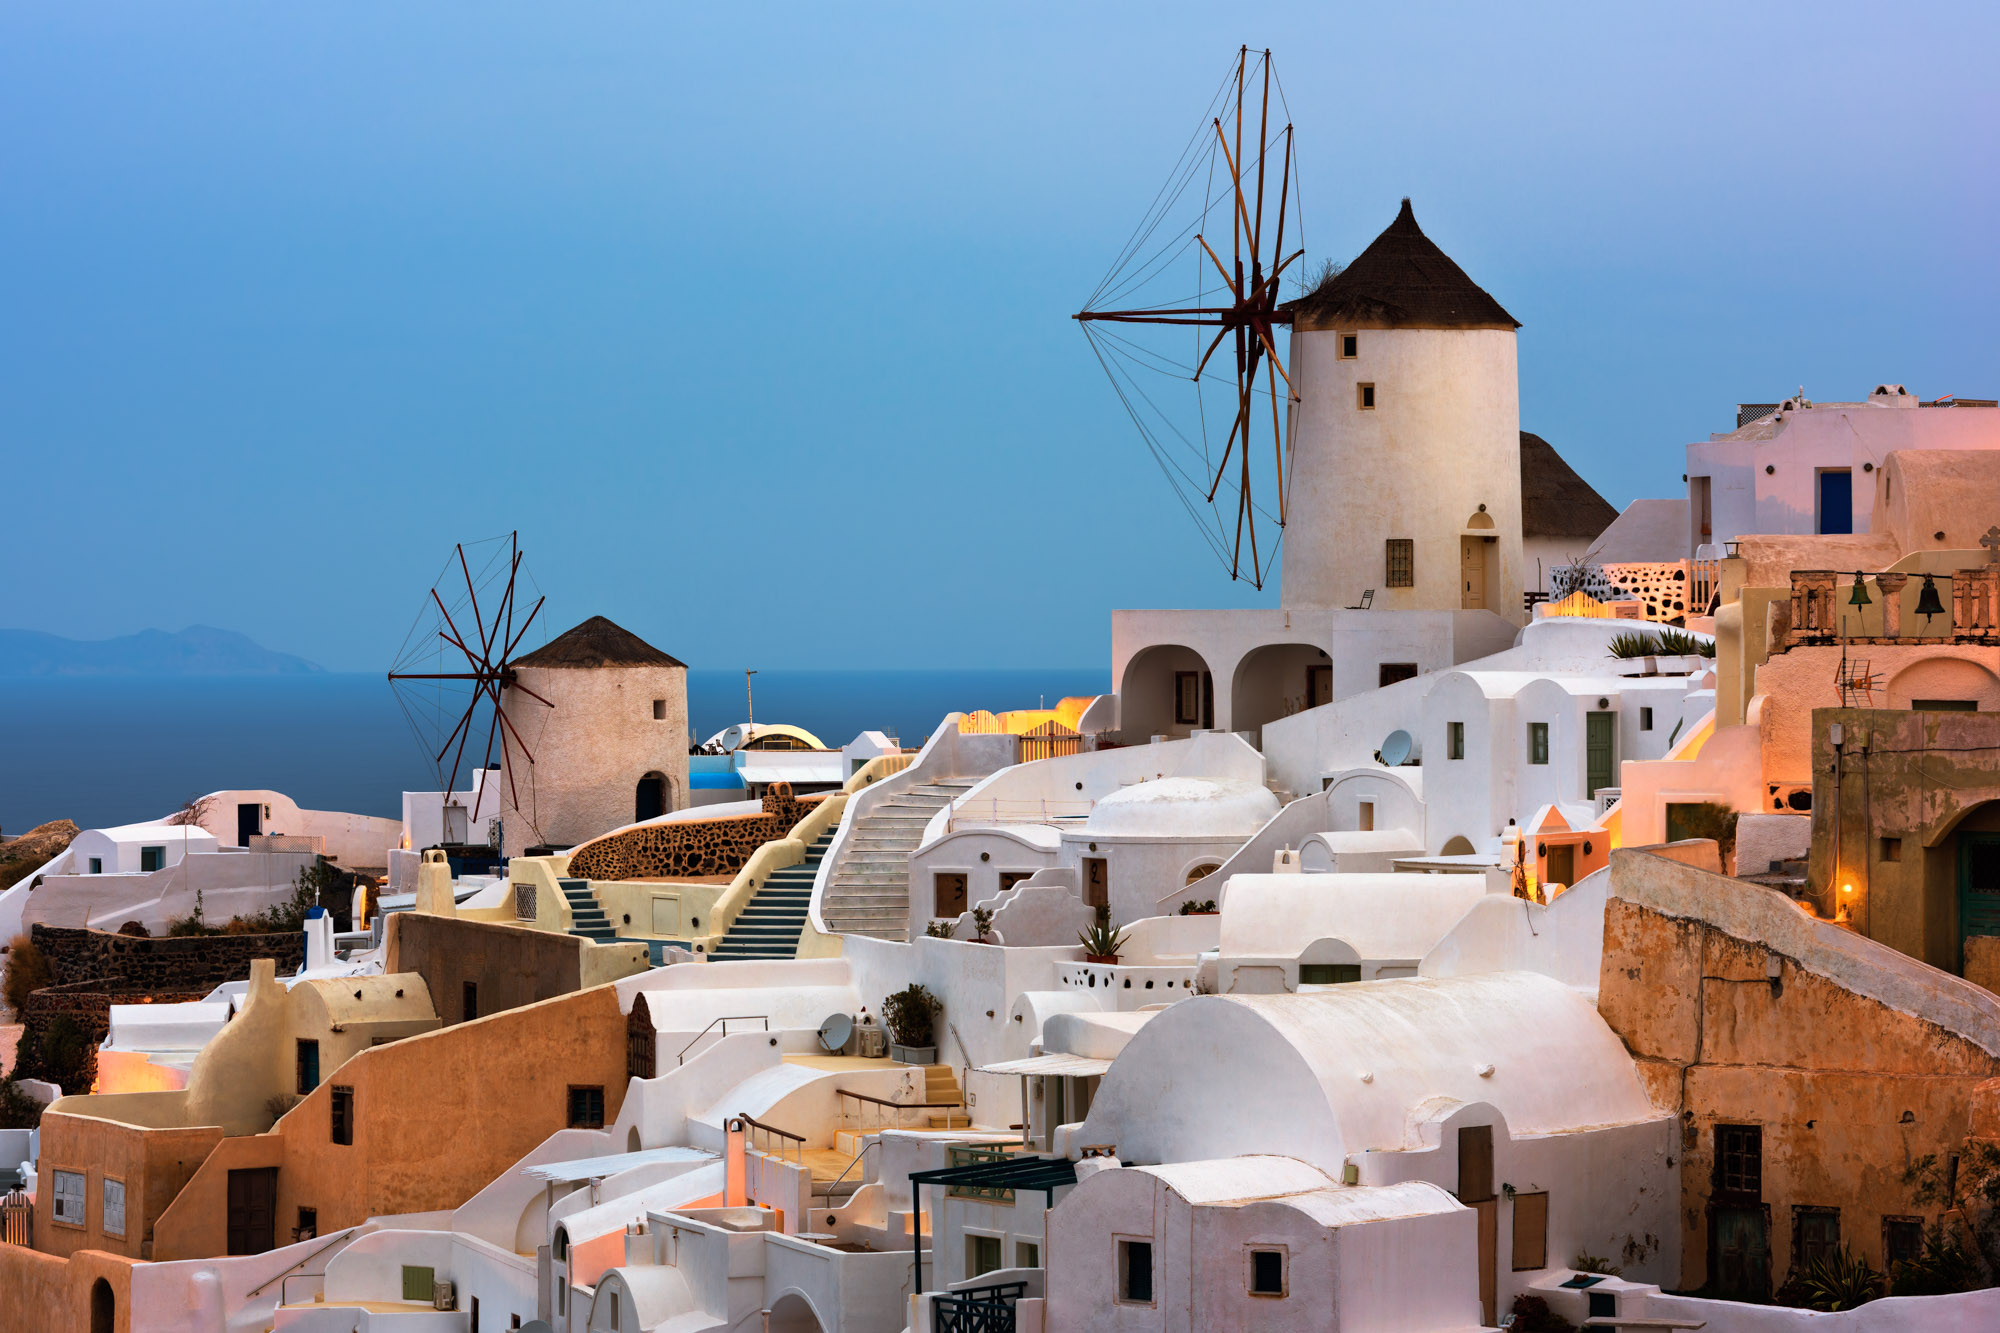 Windmills, Oia Village, Dawn, Santorini, Greece